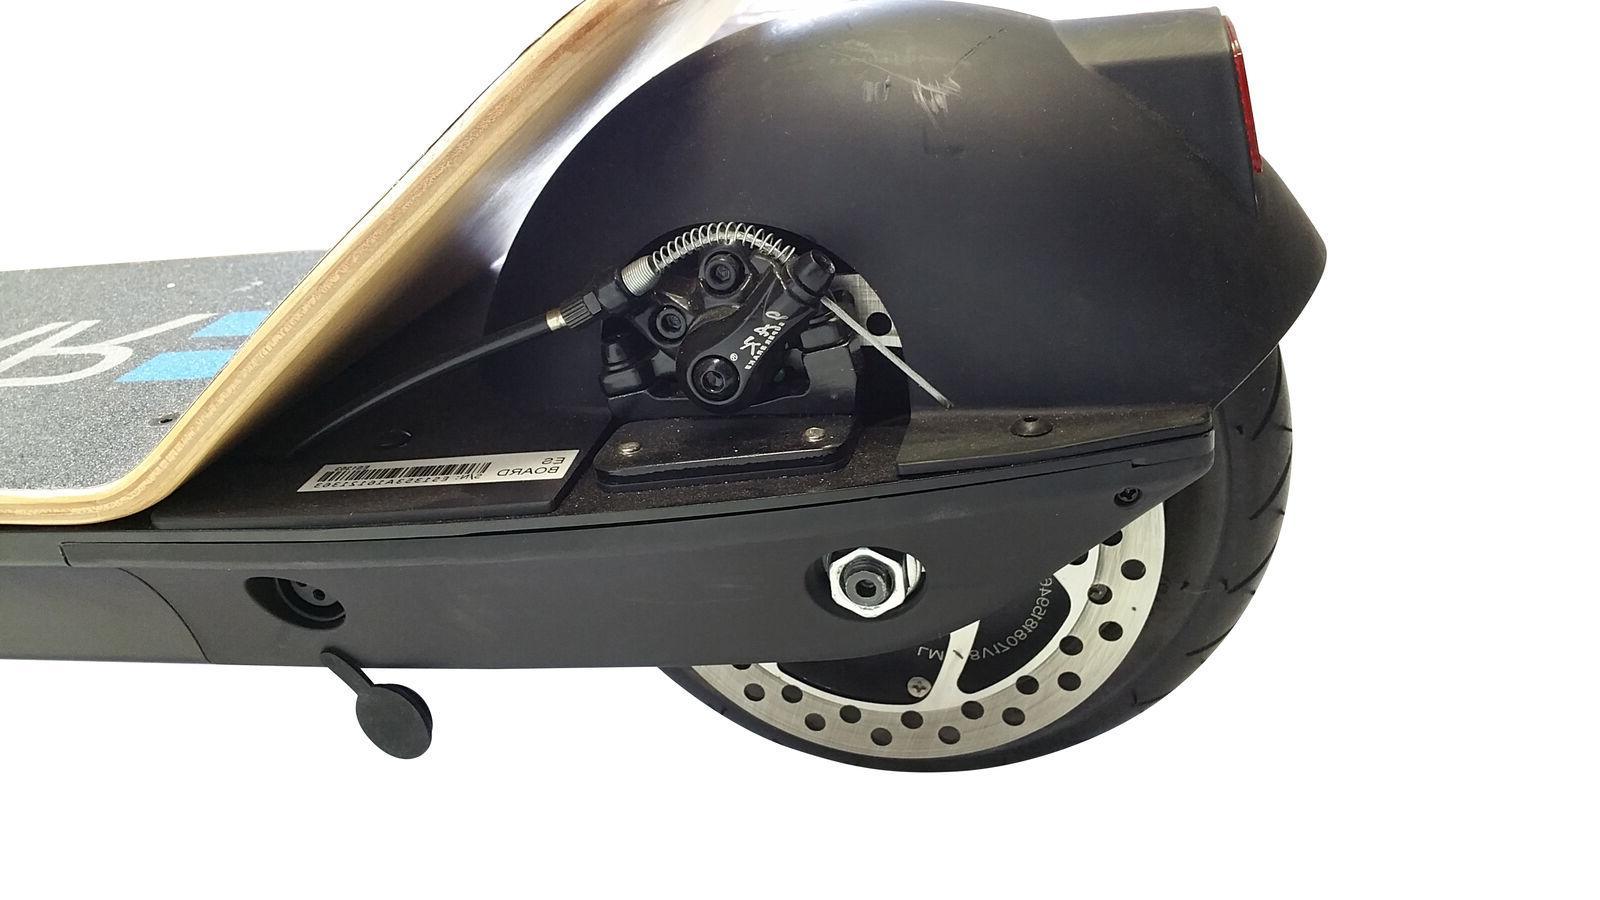 ES Board 3 Wheel Scooter 18.6mph Ion